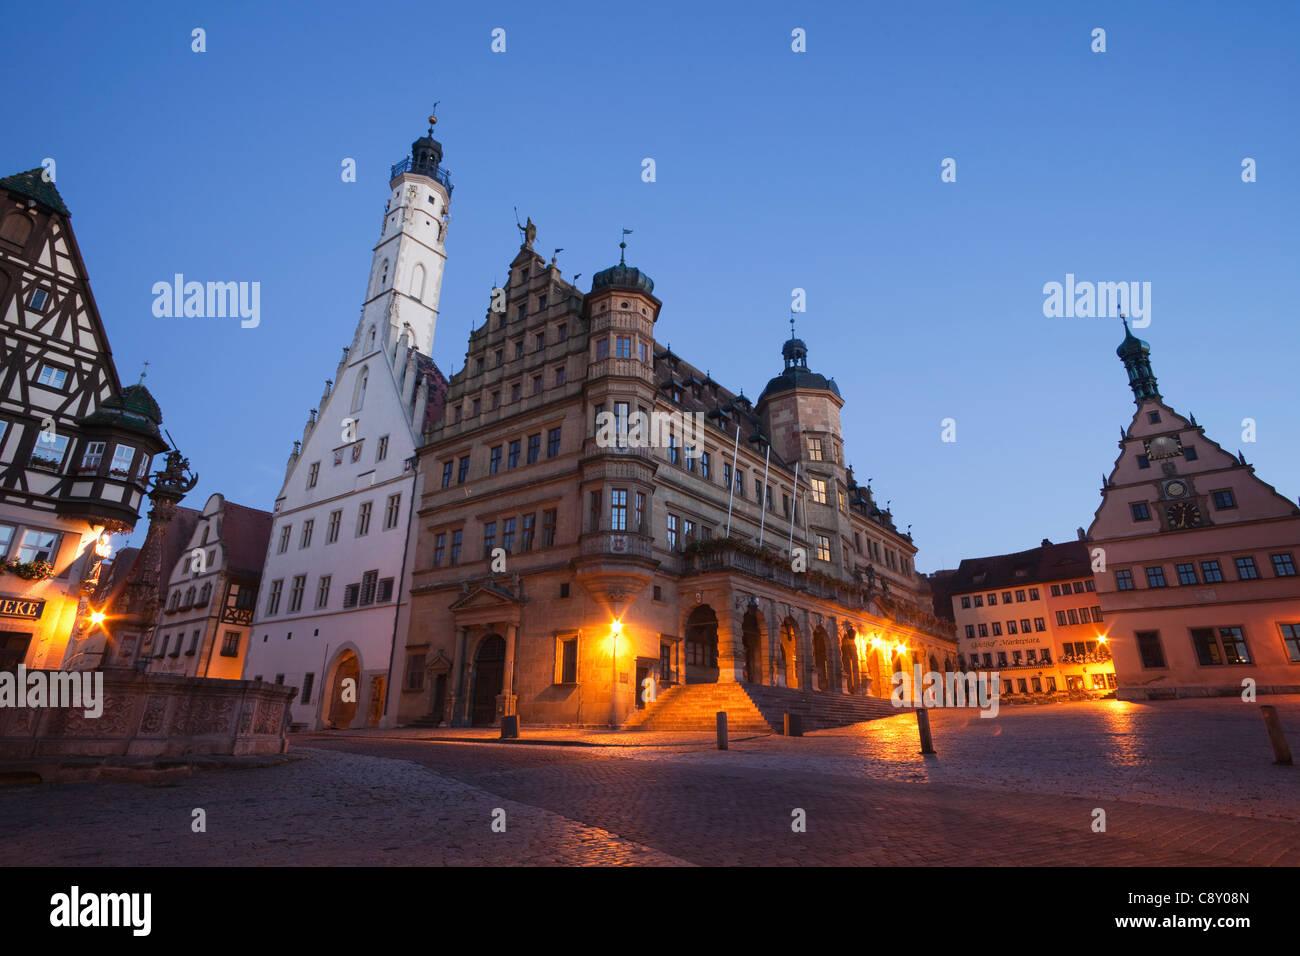 Germany, Bavaria, Romantic Road, Rothenburg ob der Tauber, Rathaus or Town Hall - Stock Image